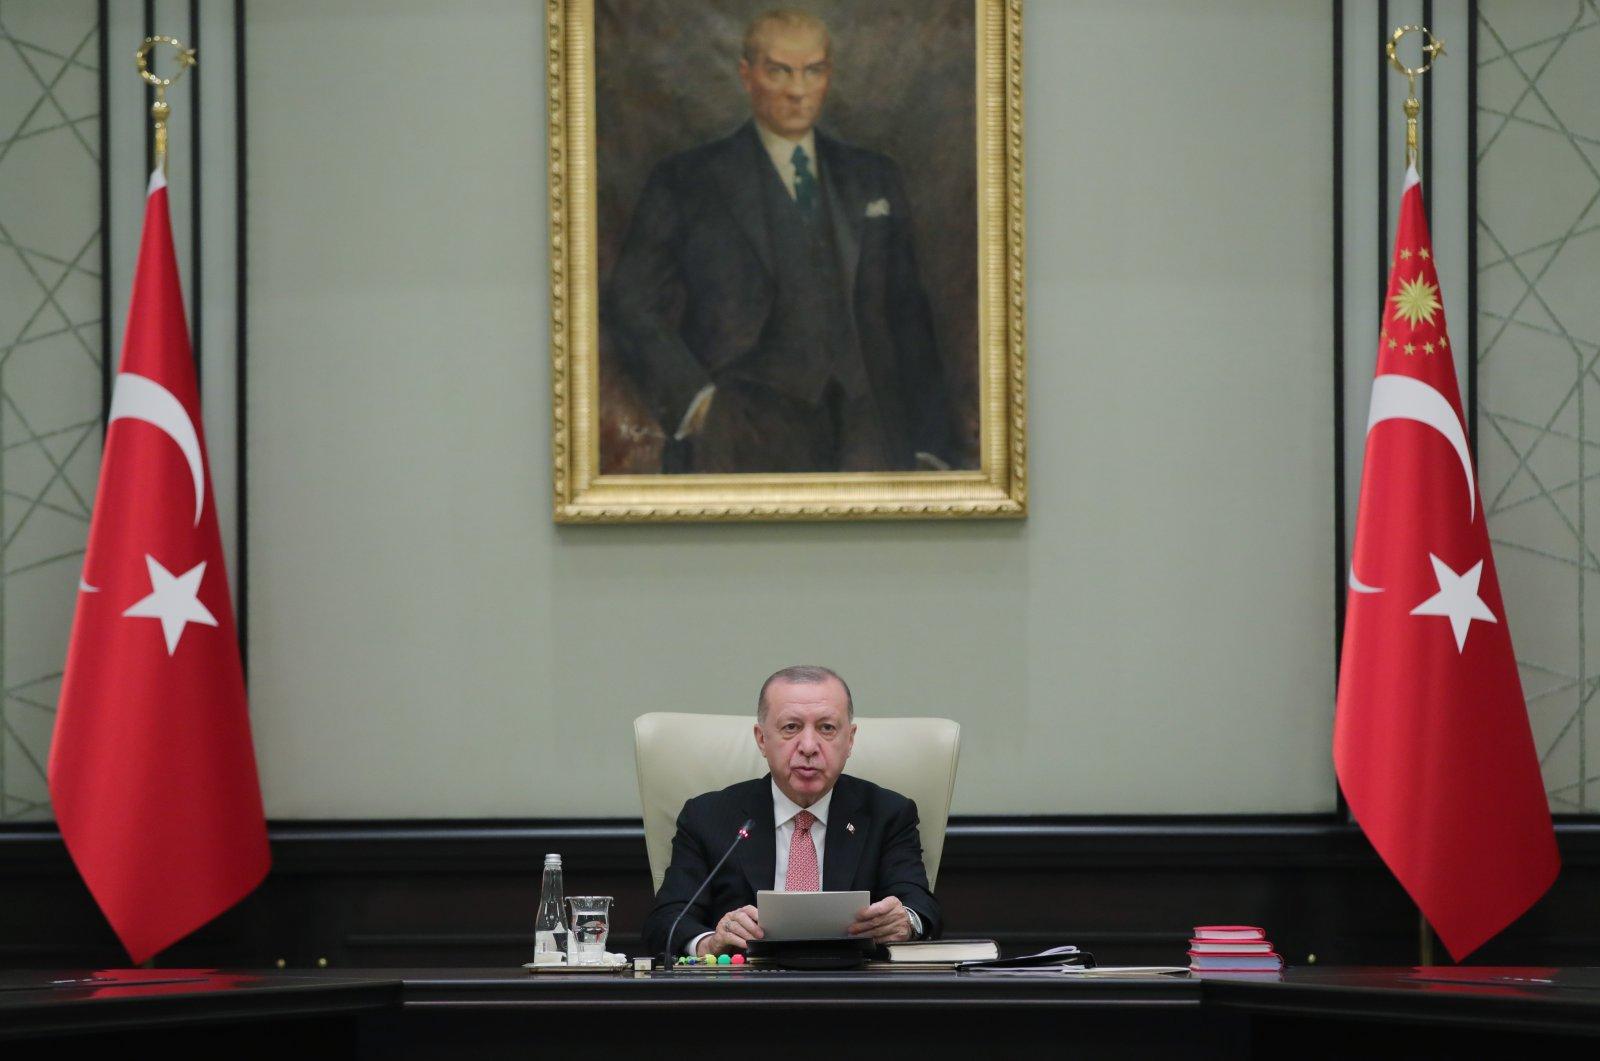 President Recep Tayyip Erdoğan prepares to start a Cabinet meeting at the Presidential Complex in Ankara, Turkey, June 21, 2021. (AA Photo)